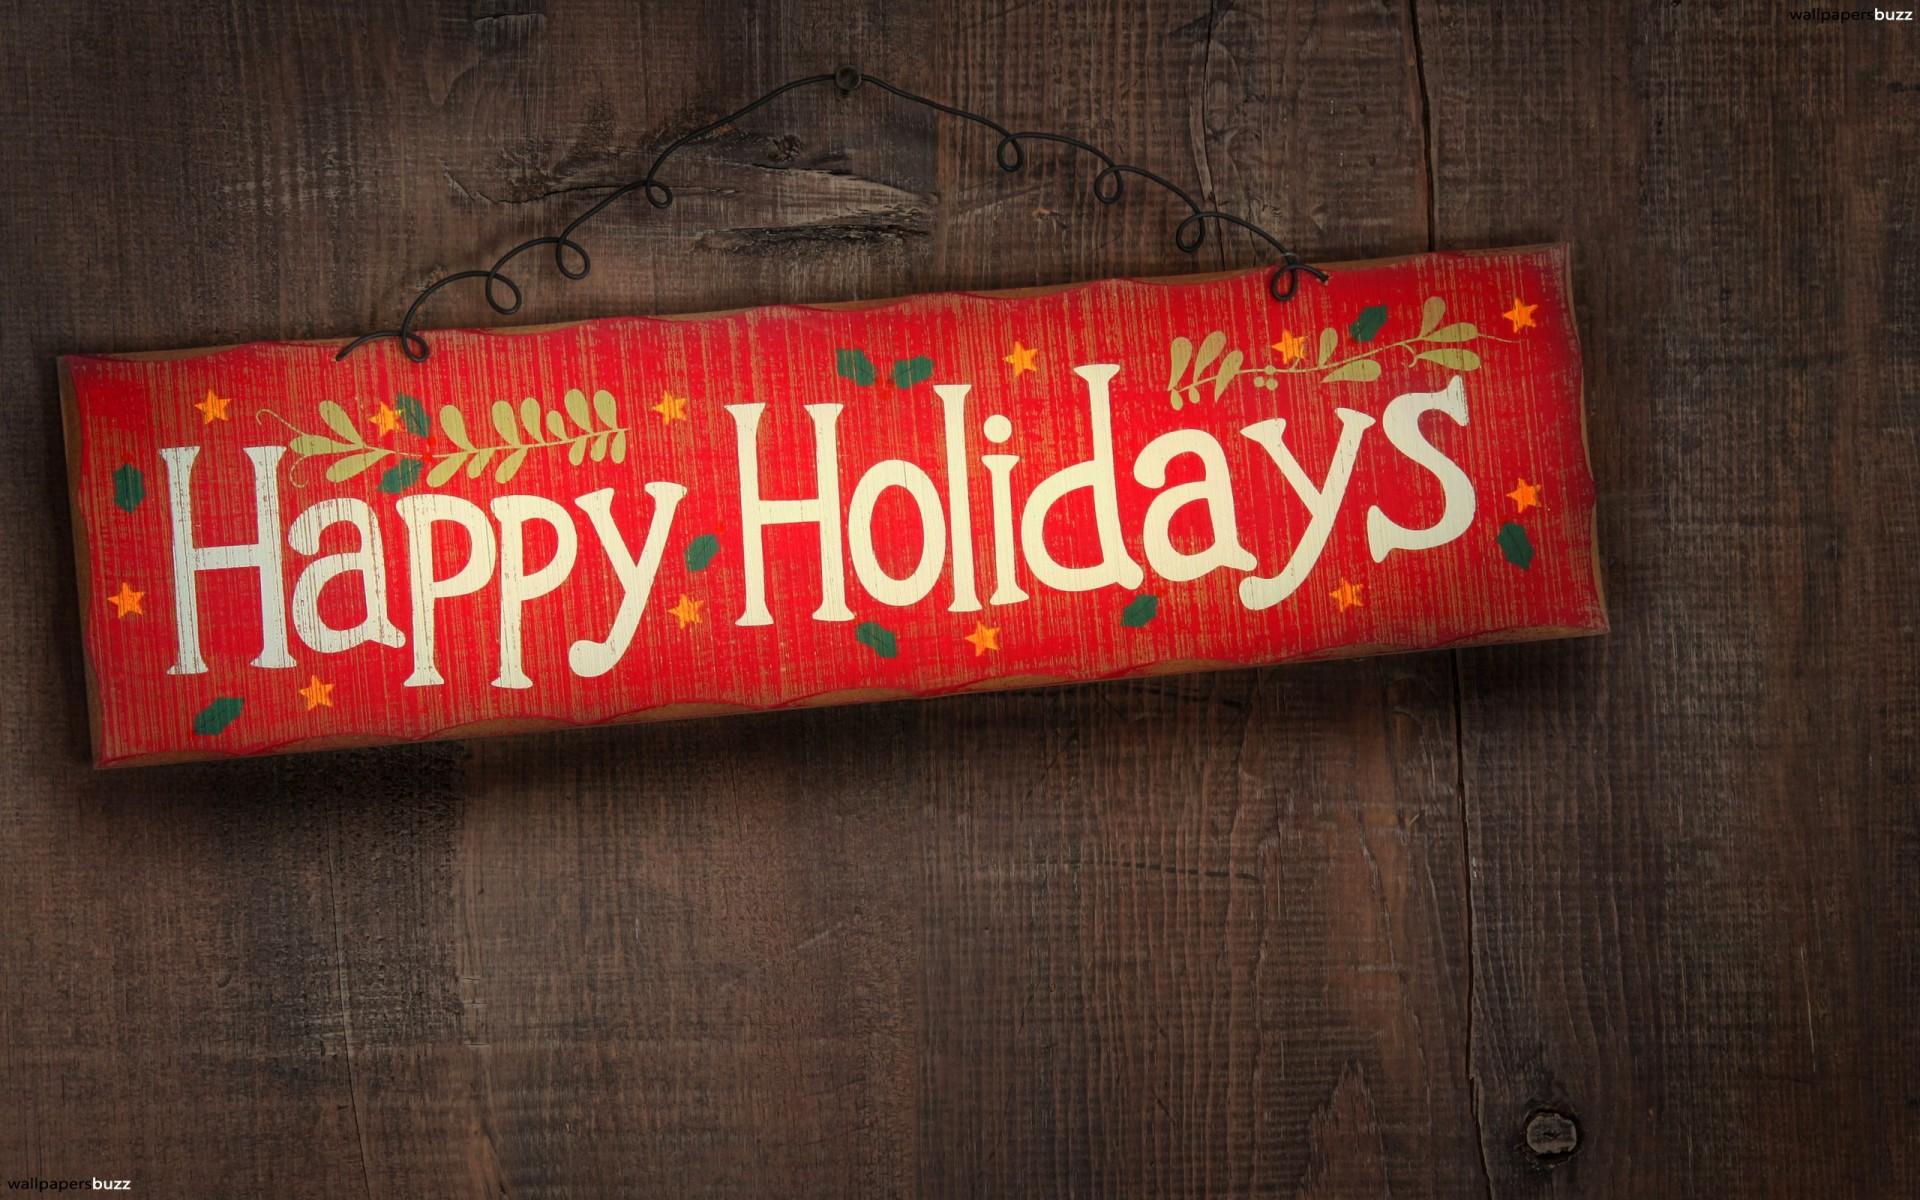 Happy-Holidays-Card-Image.jpg